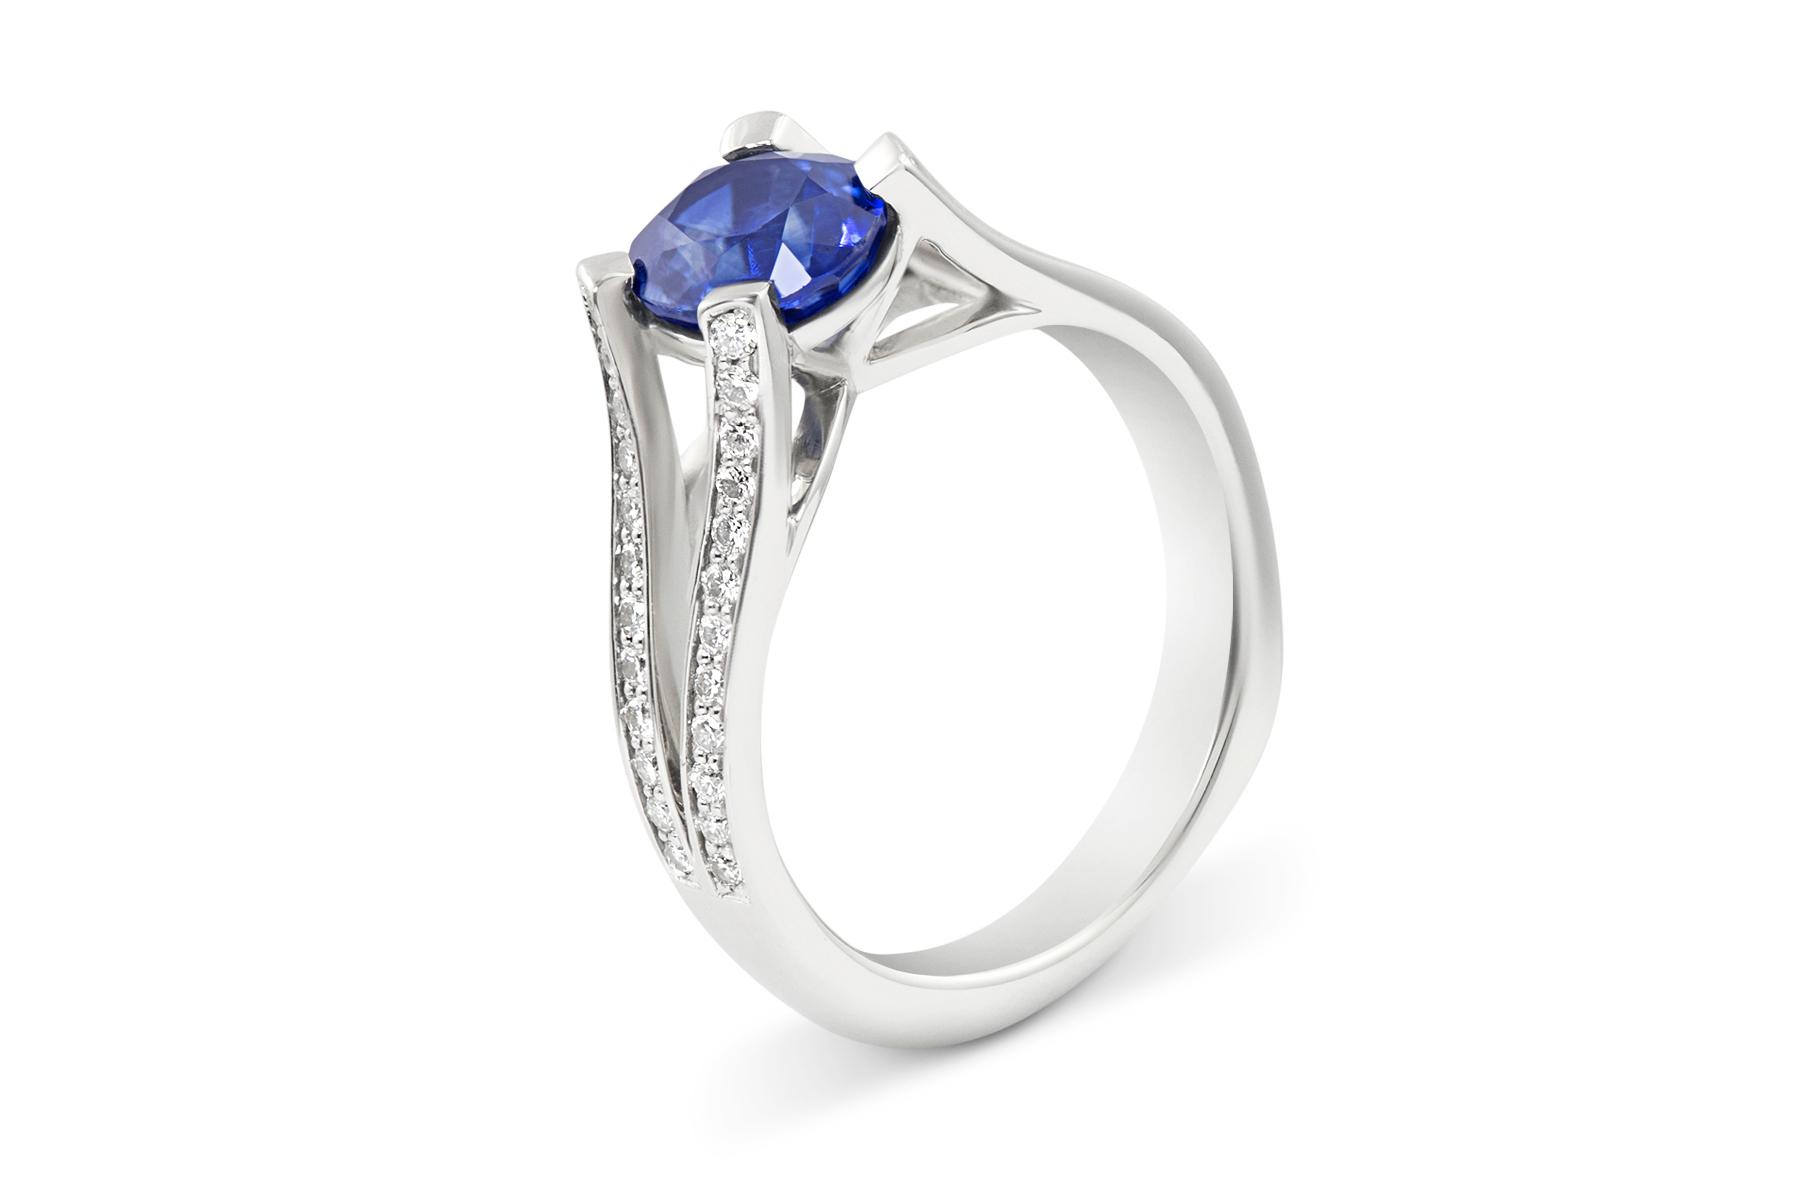 Sapphire-Ring-Angle-View.jpg